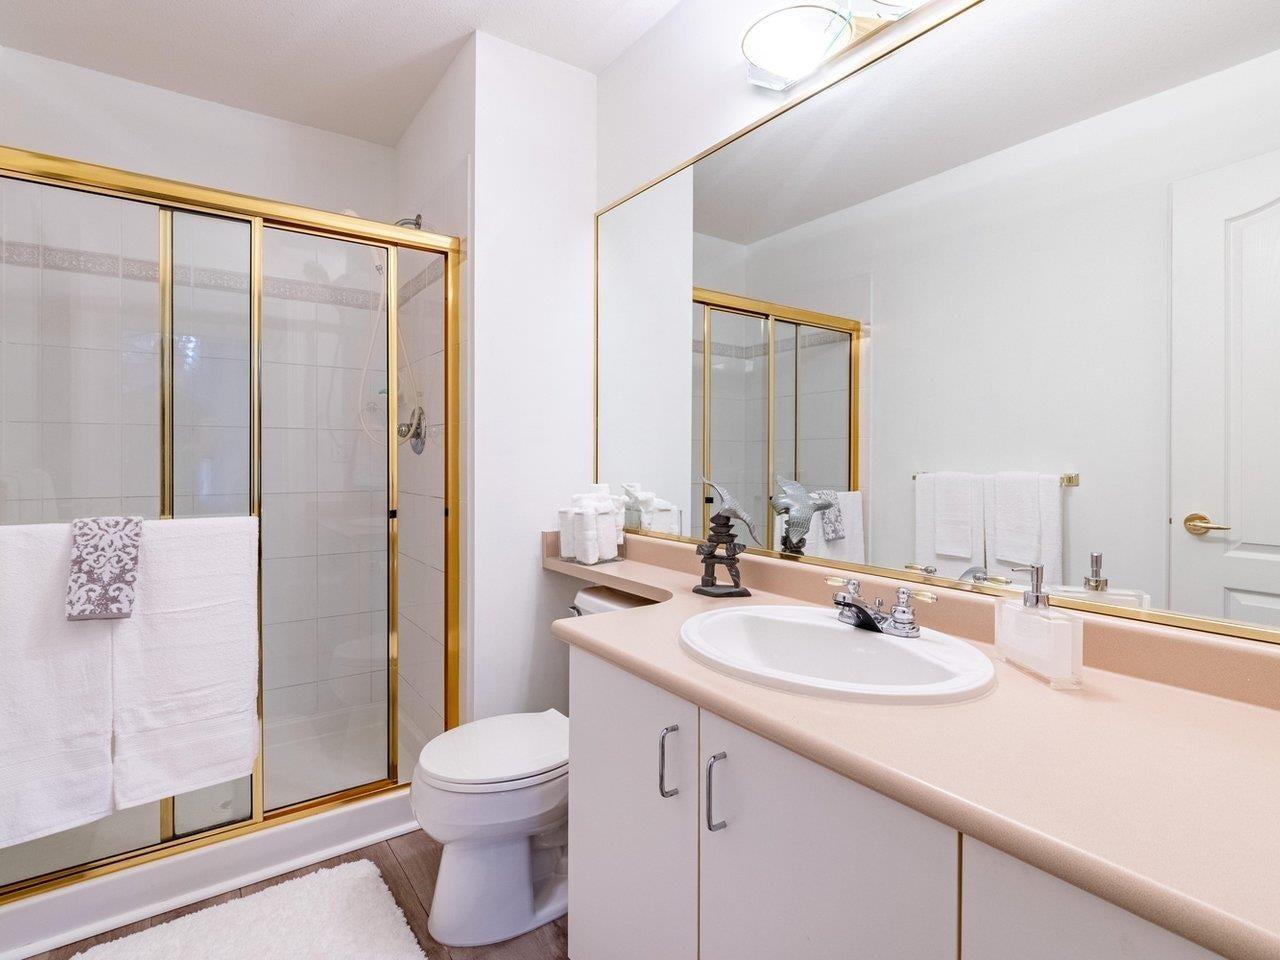 306 15298 20 AVENUE - King George Corridor Apartment/Condo for sale, 2 Bedrooms (R2625551) - #25